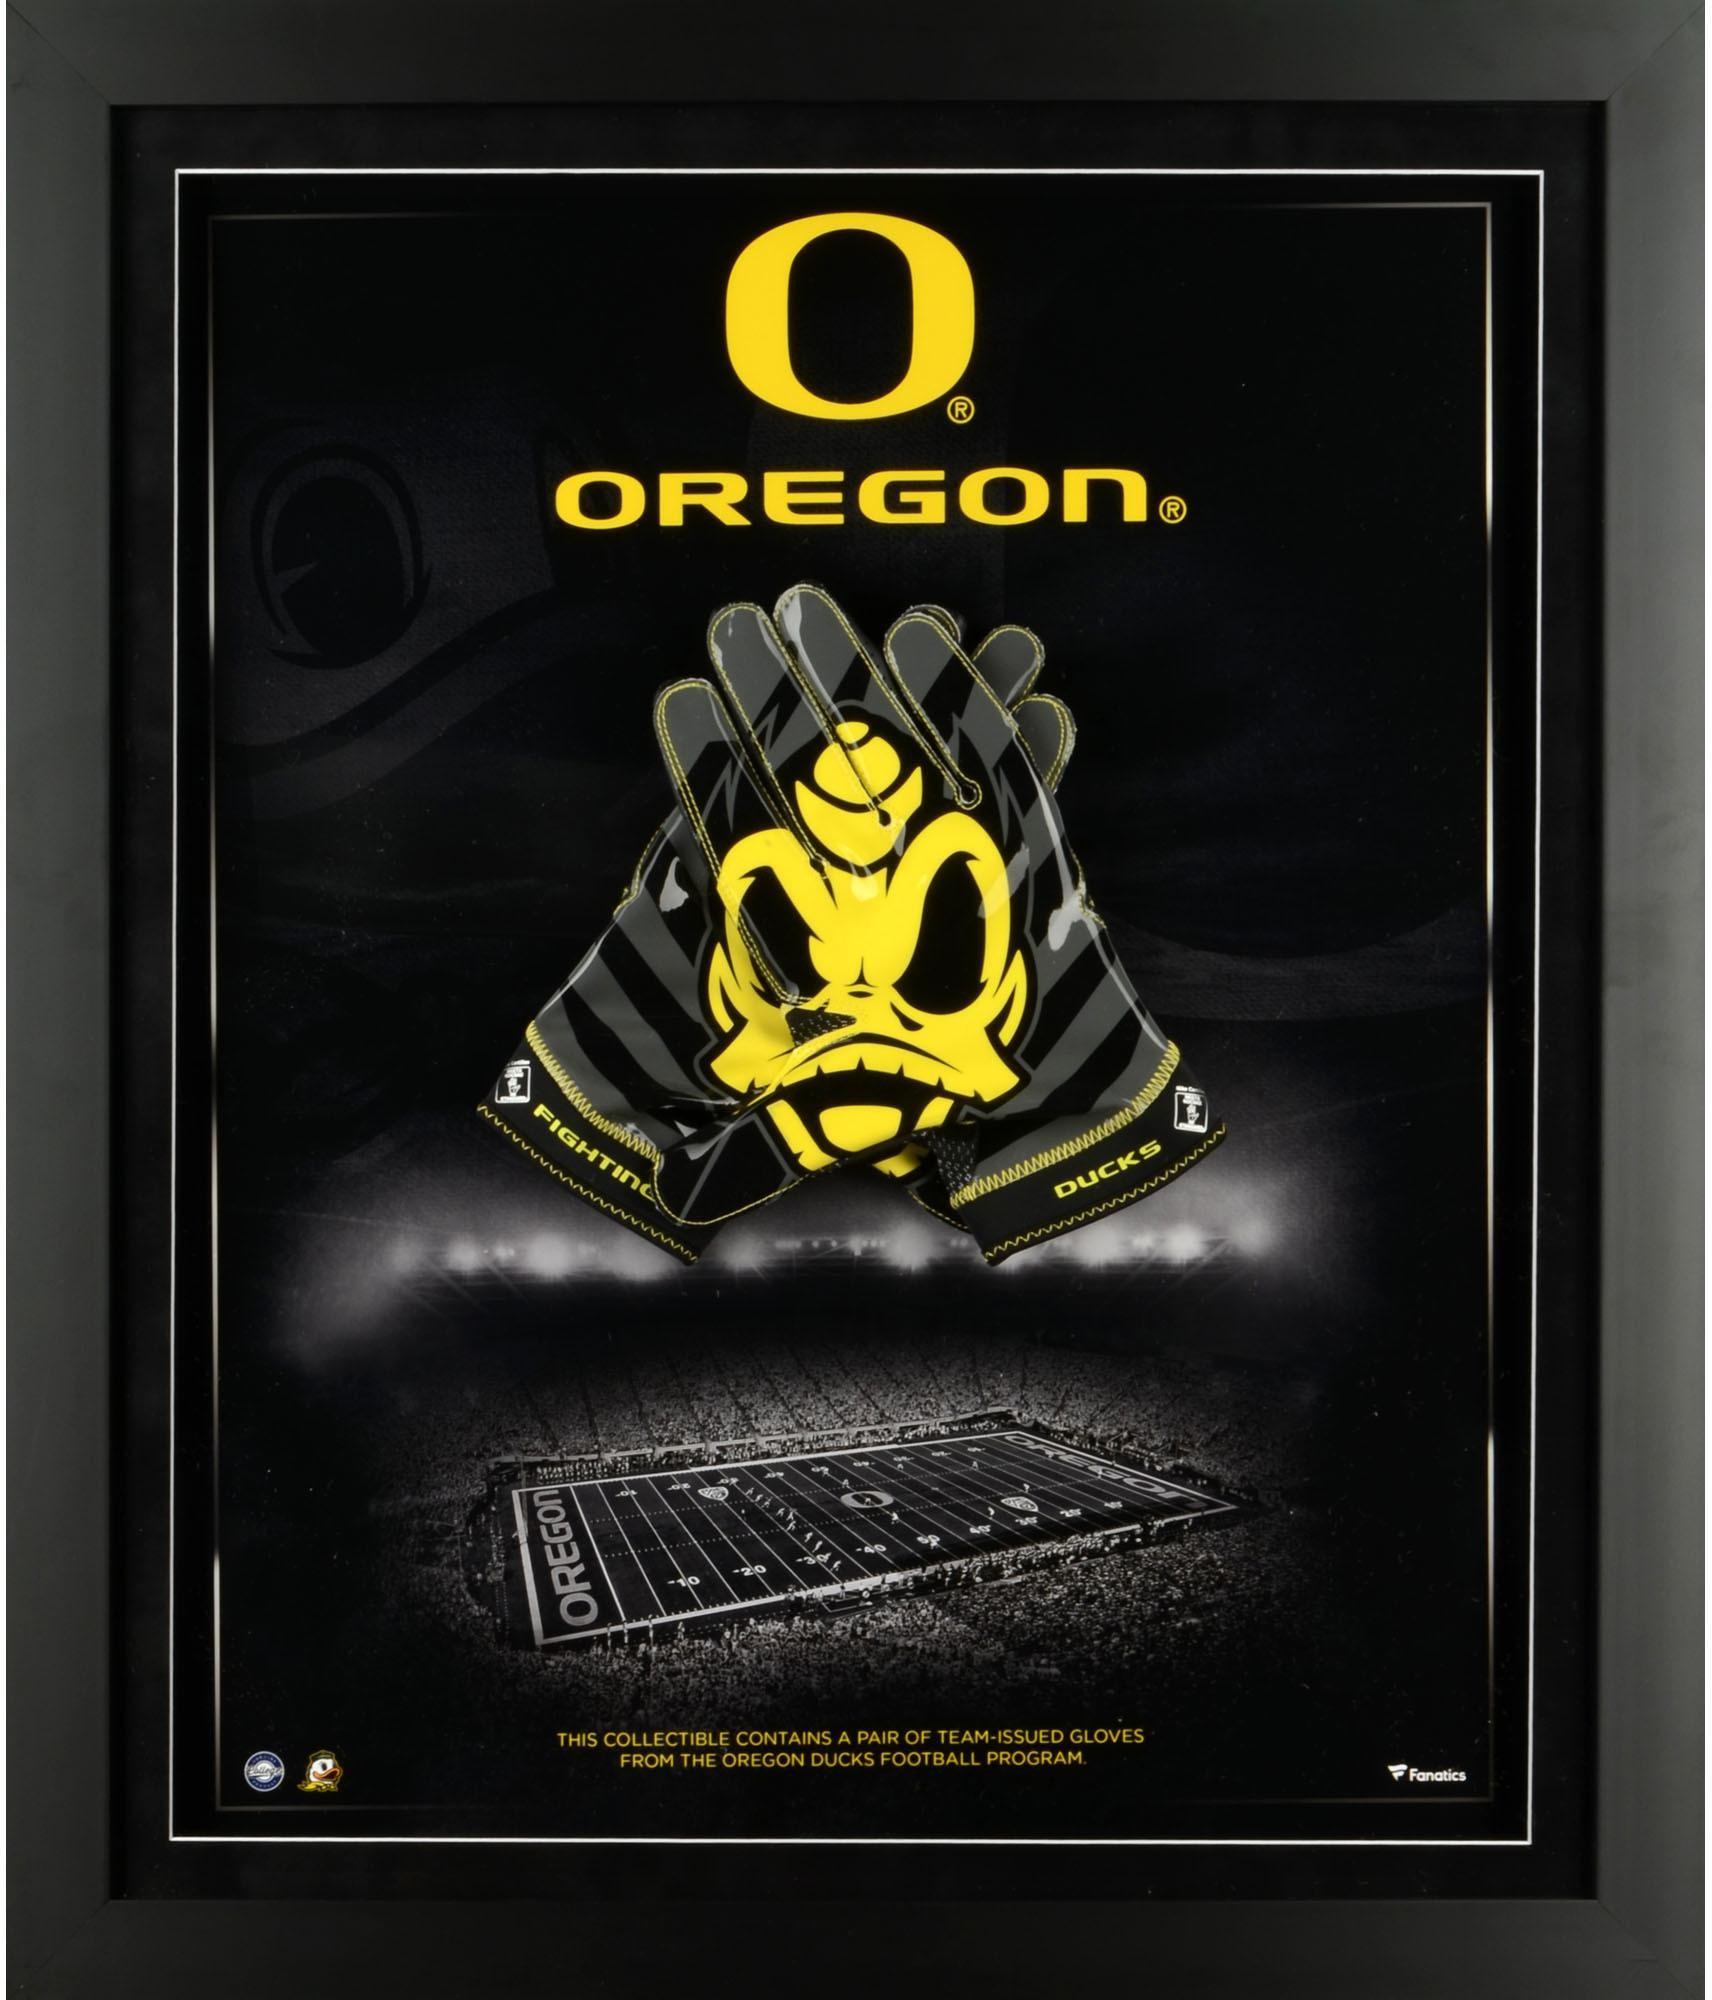 Oregon Ducks Backgrounds (63+ pictures)